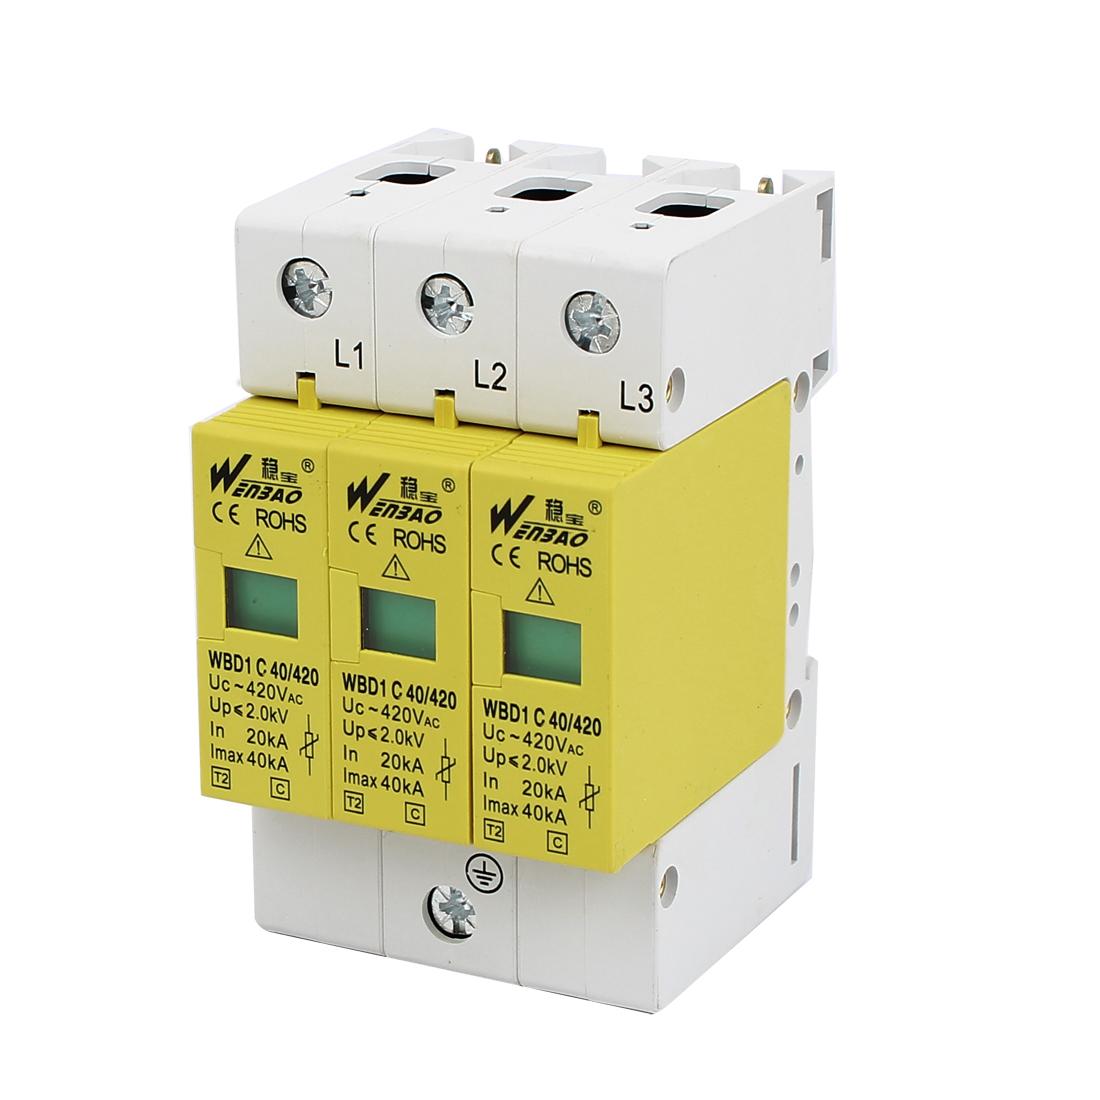 AC 420V 40KA 20KA 3P DIN Rail Mount Surge Protection Device Arrester